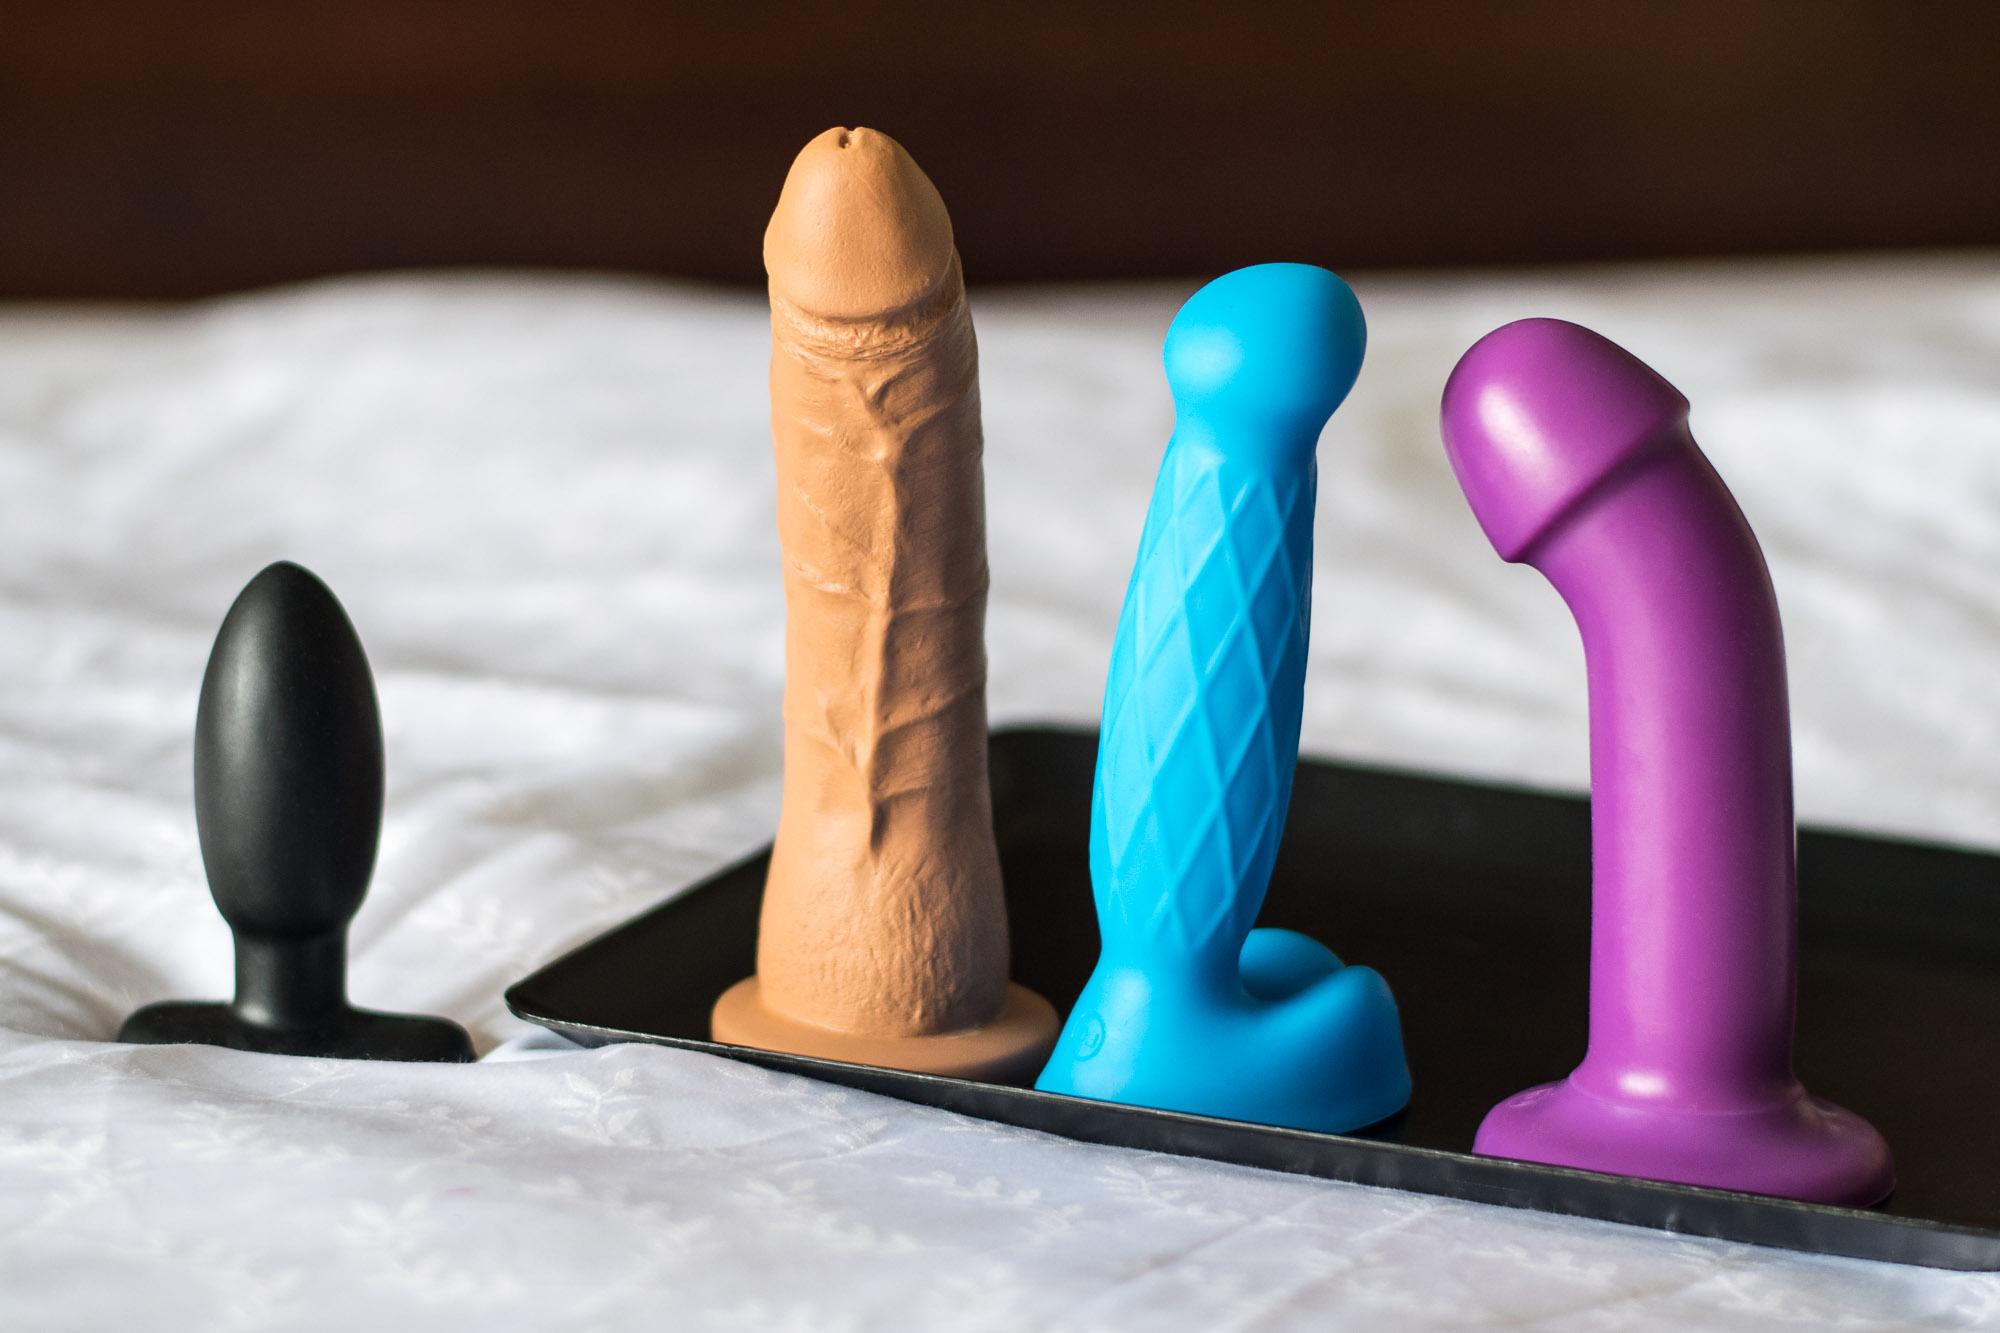 Doc Johnson TruSkyn: Tru Feel (blue), Tru Curve (purple), Tru Ride (realistic), Tru Butt Plug Smooth lying down on a black platter on top of a bed.